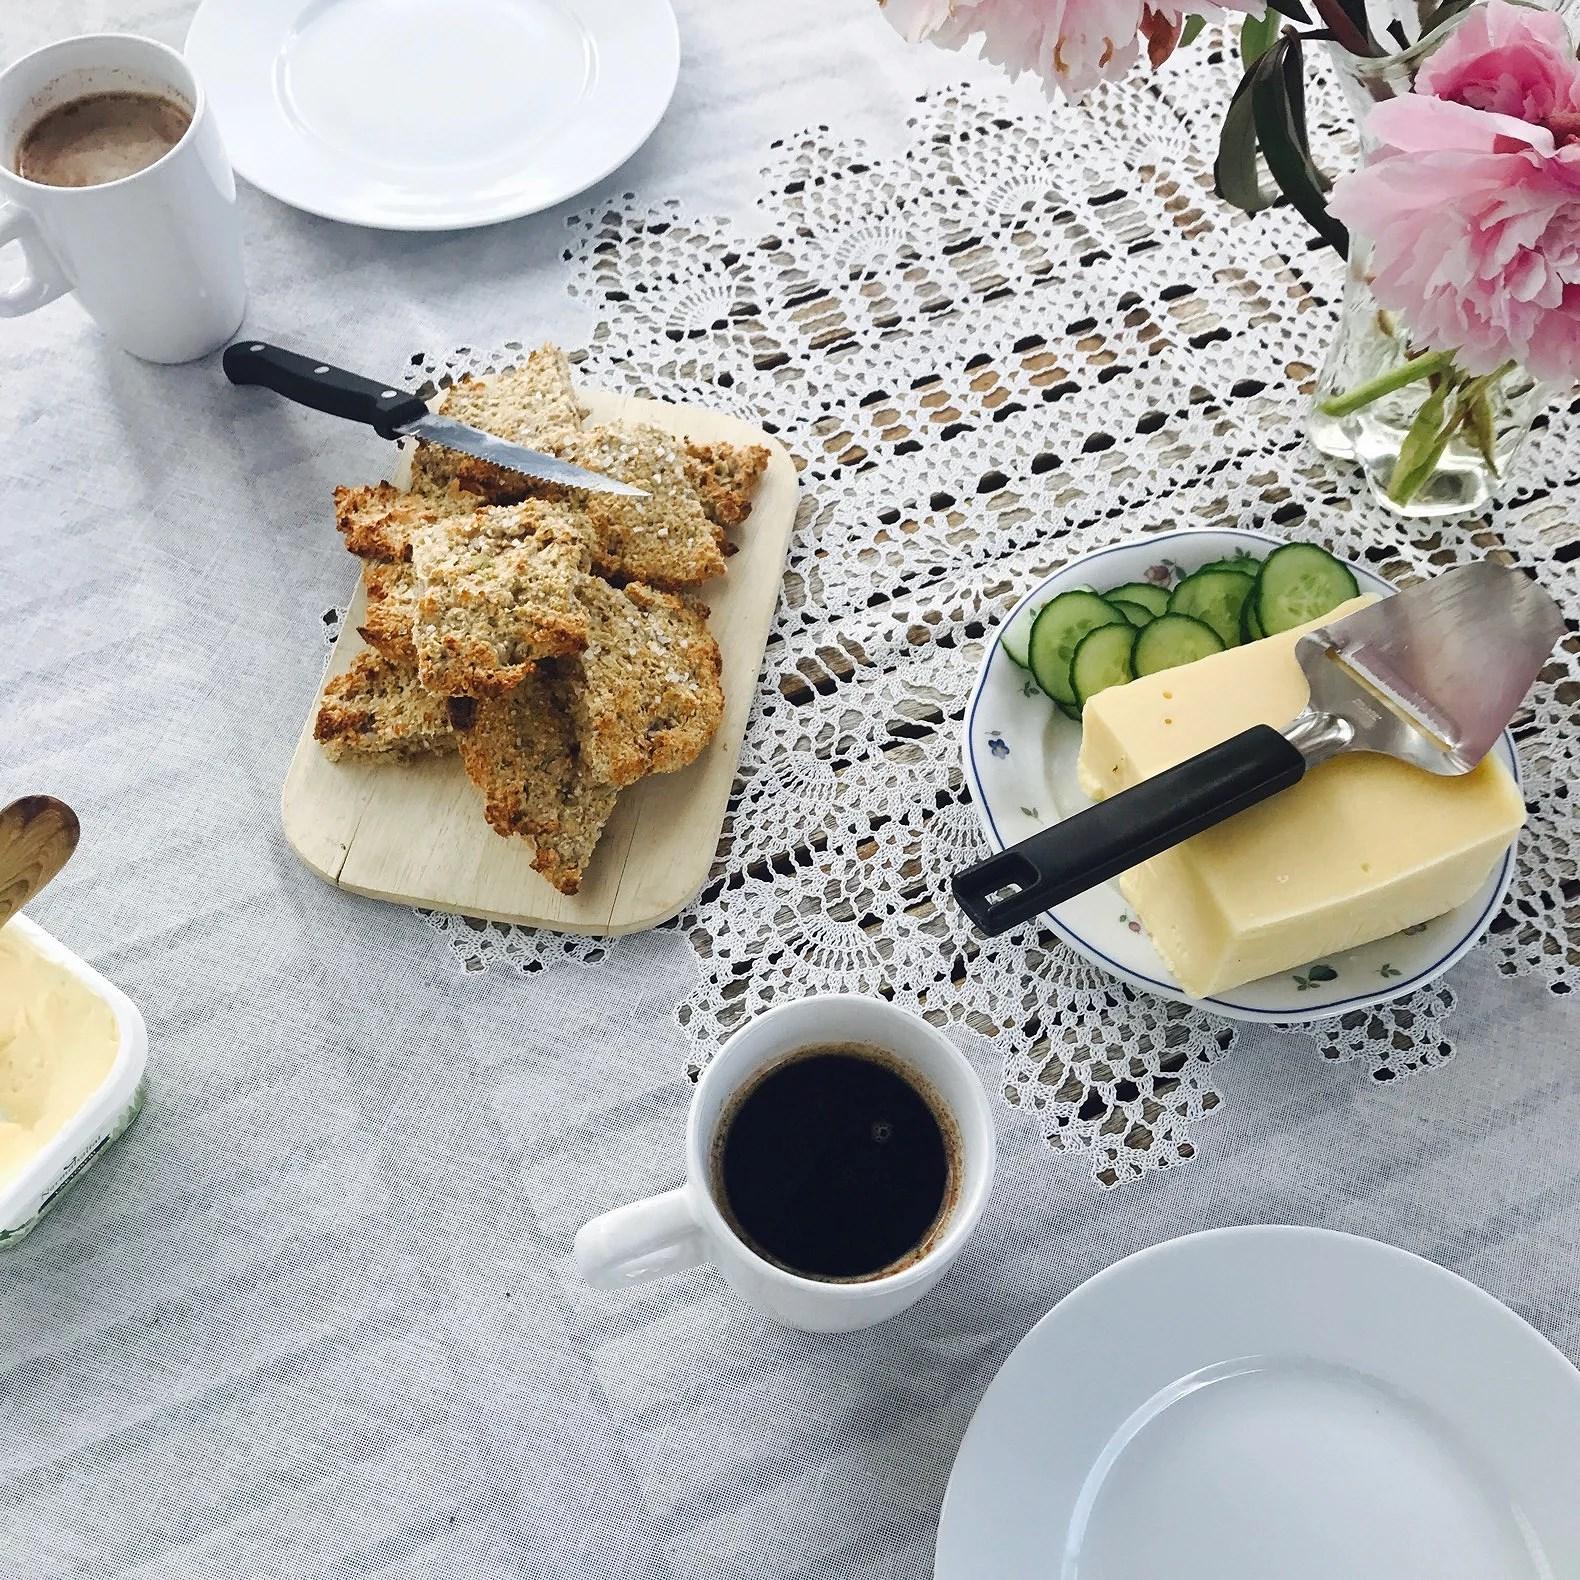 Fröigtfrukostbröd